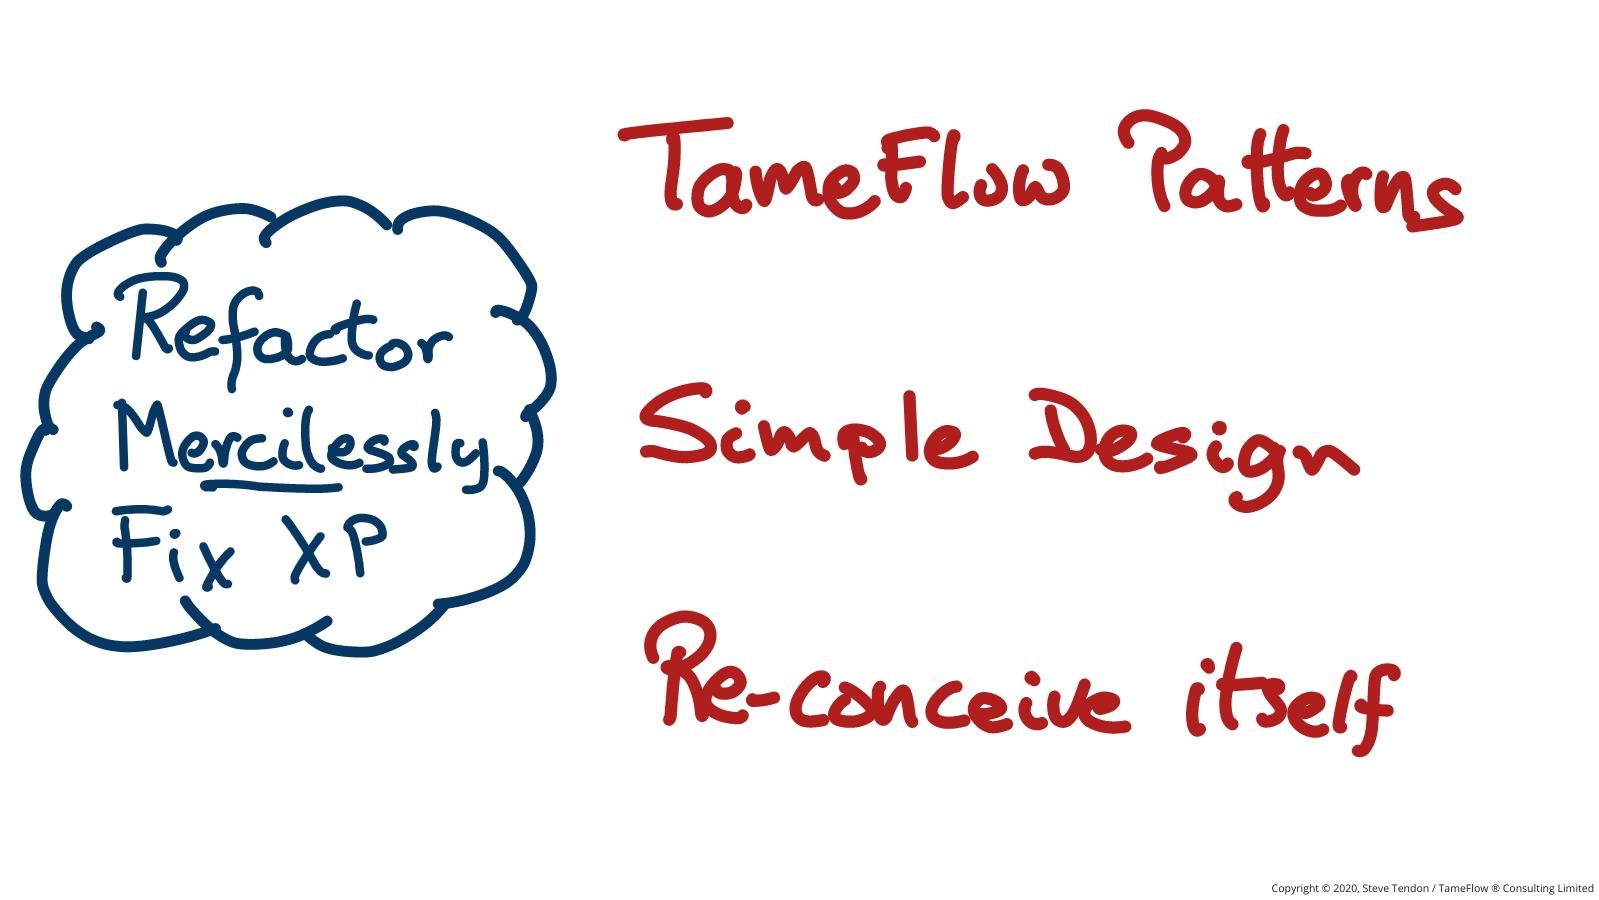 XP and TameFlow 4